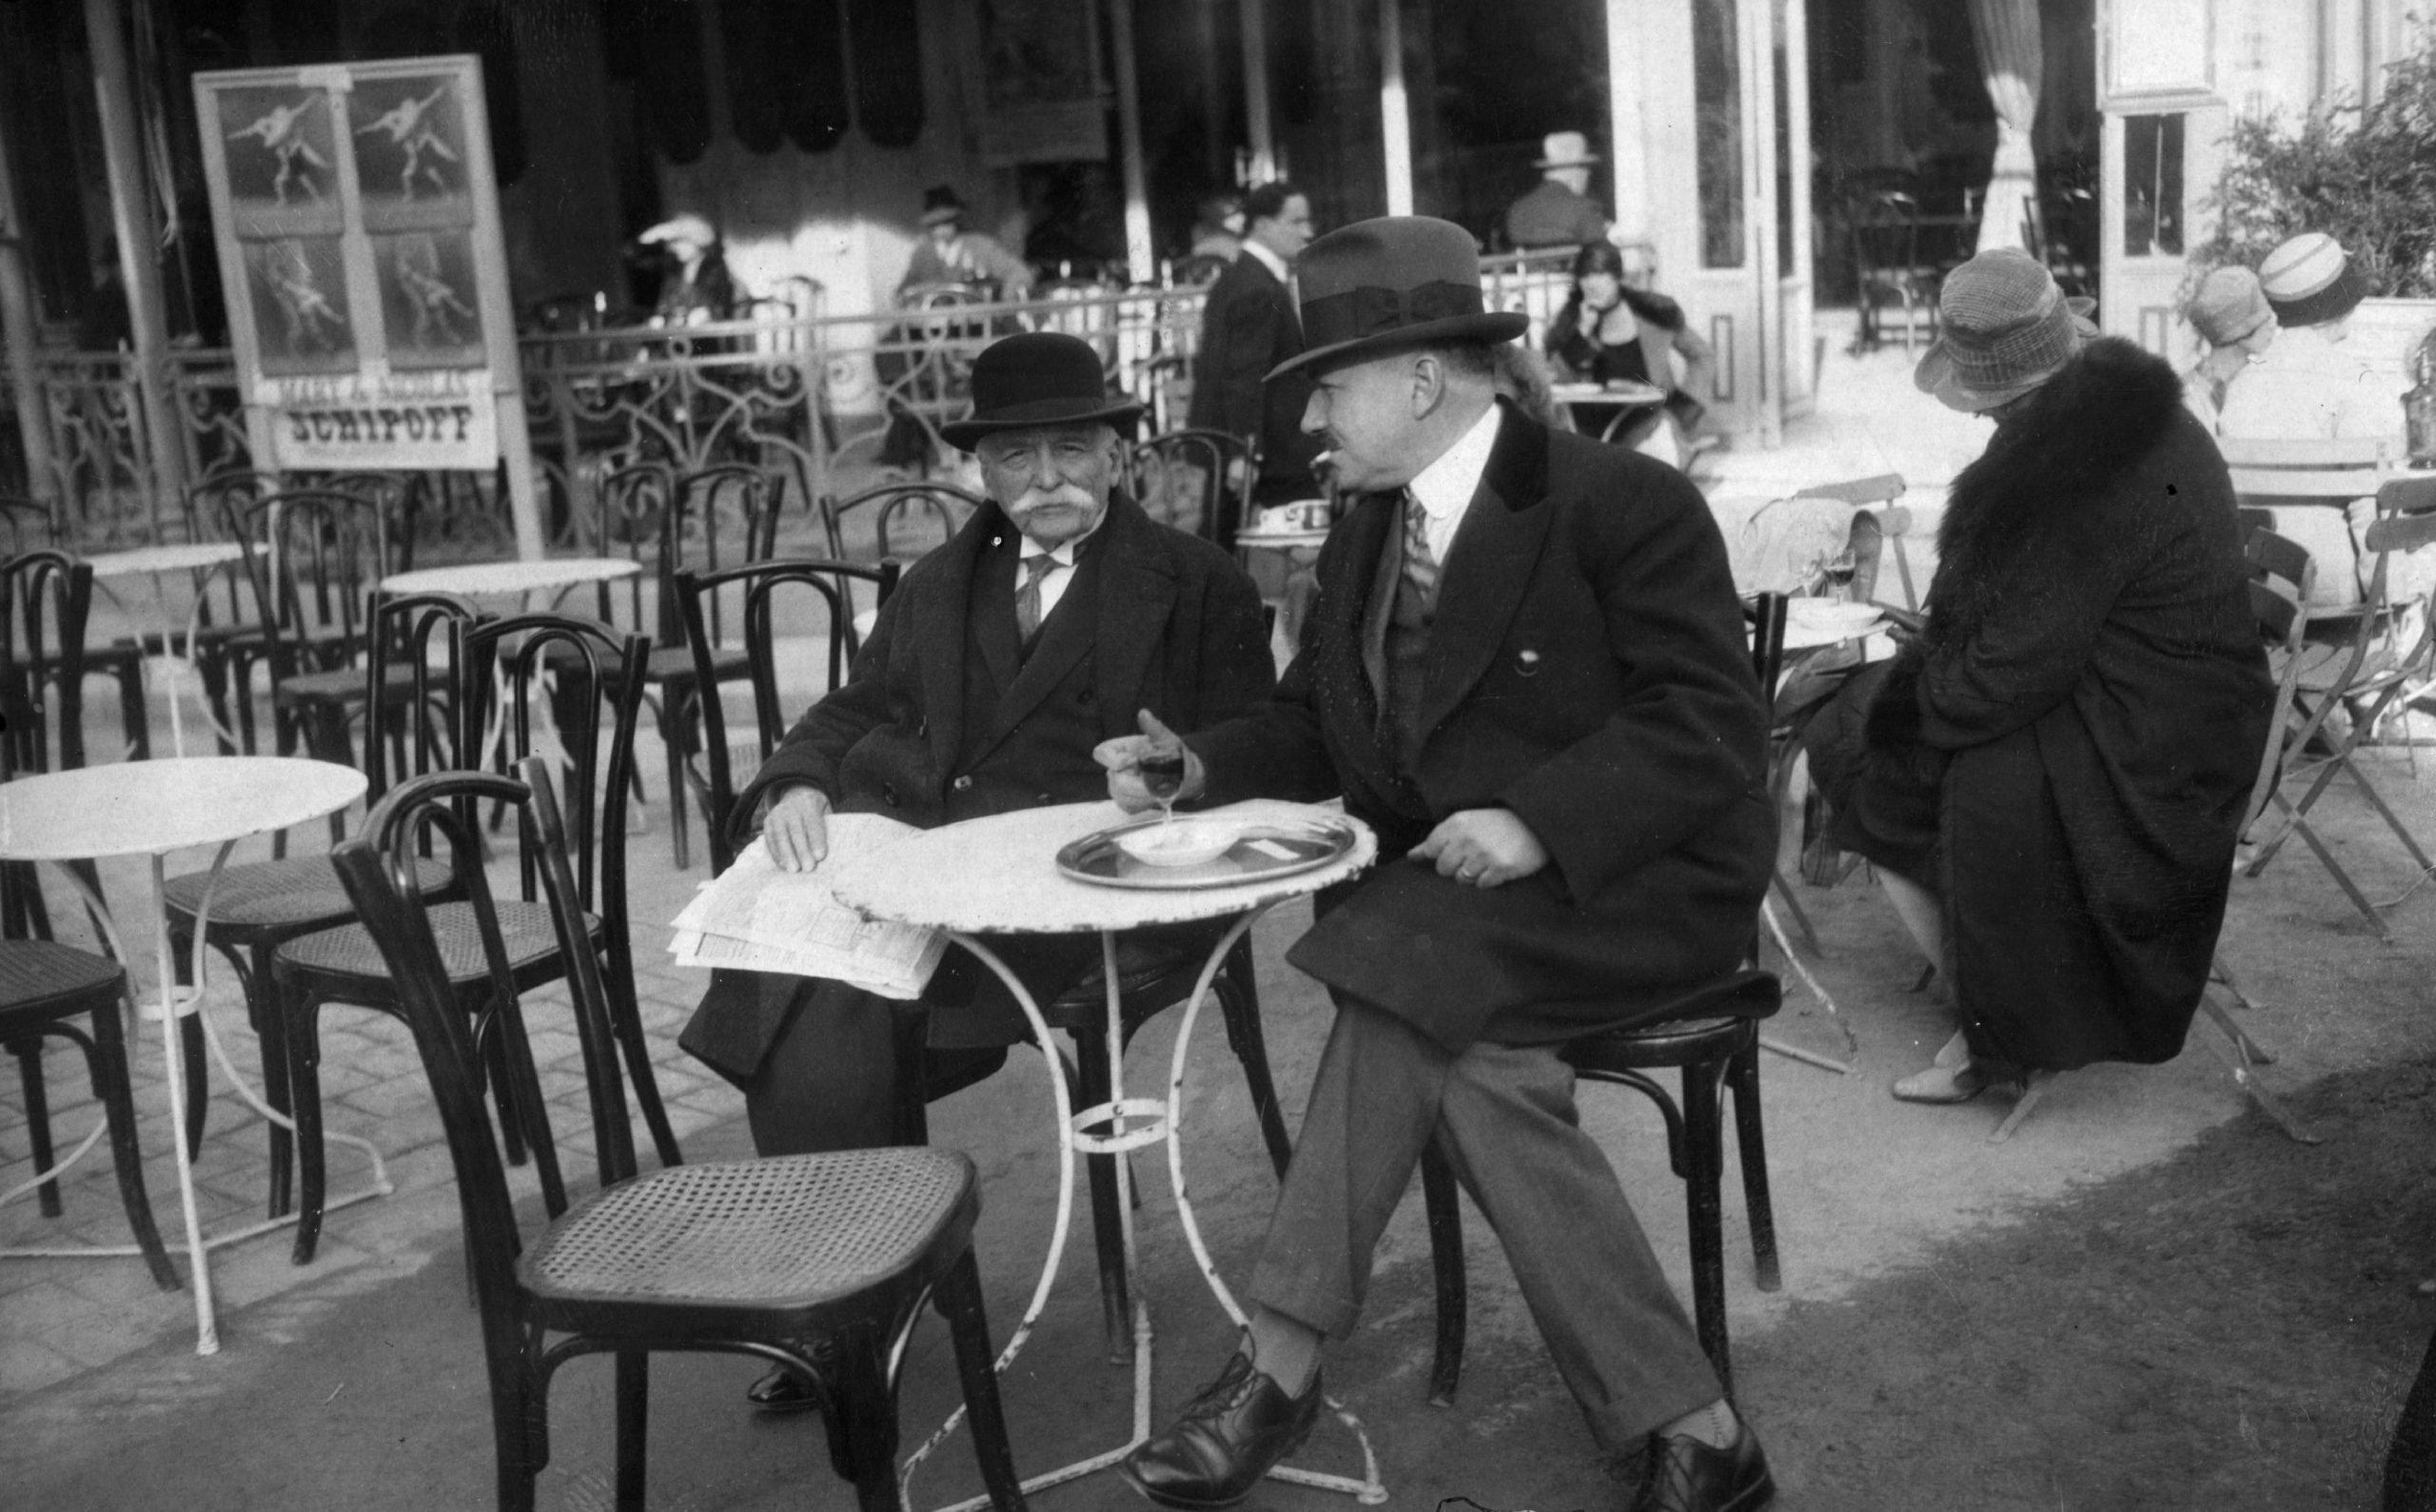 Two men sitting at a Paris Cafe